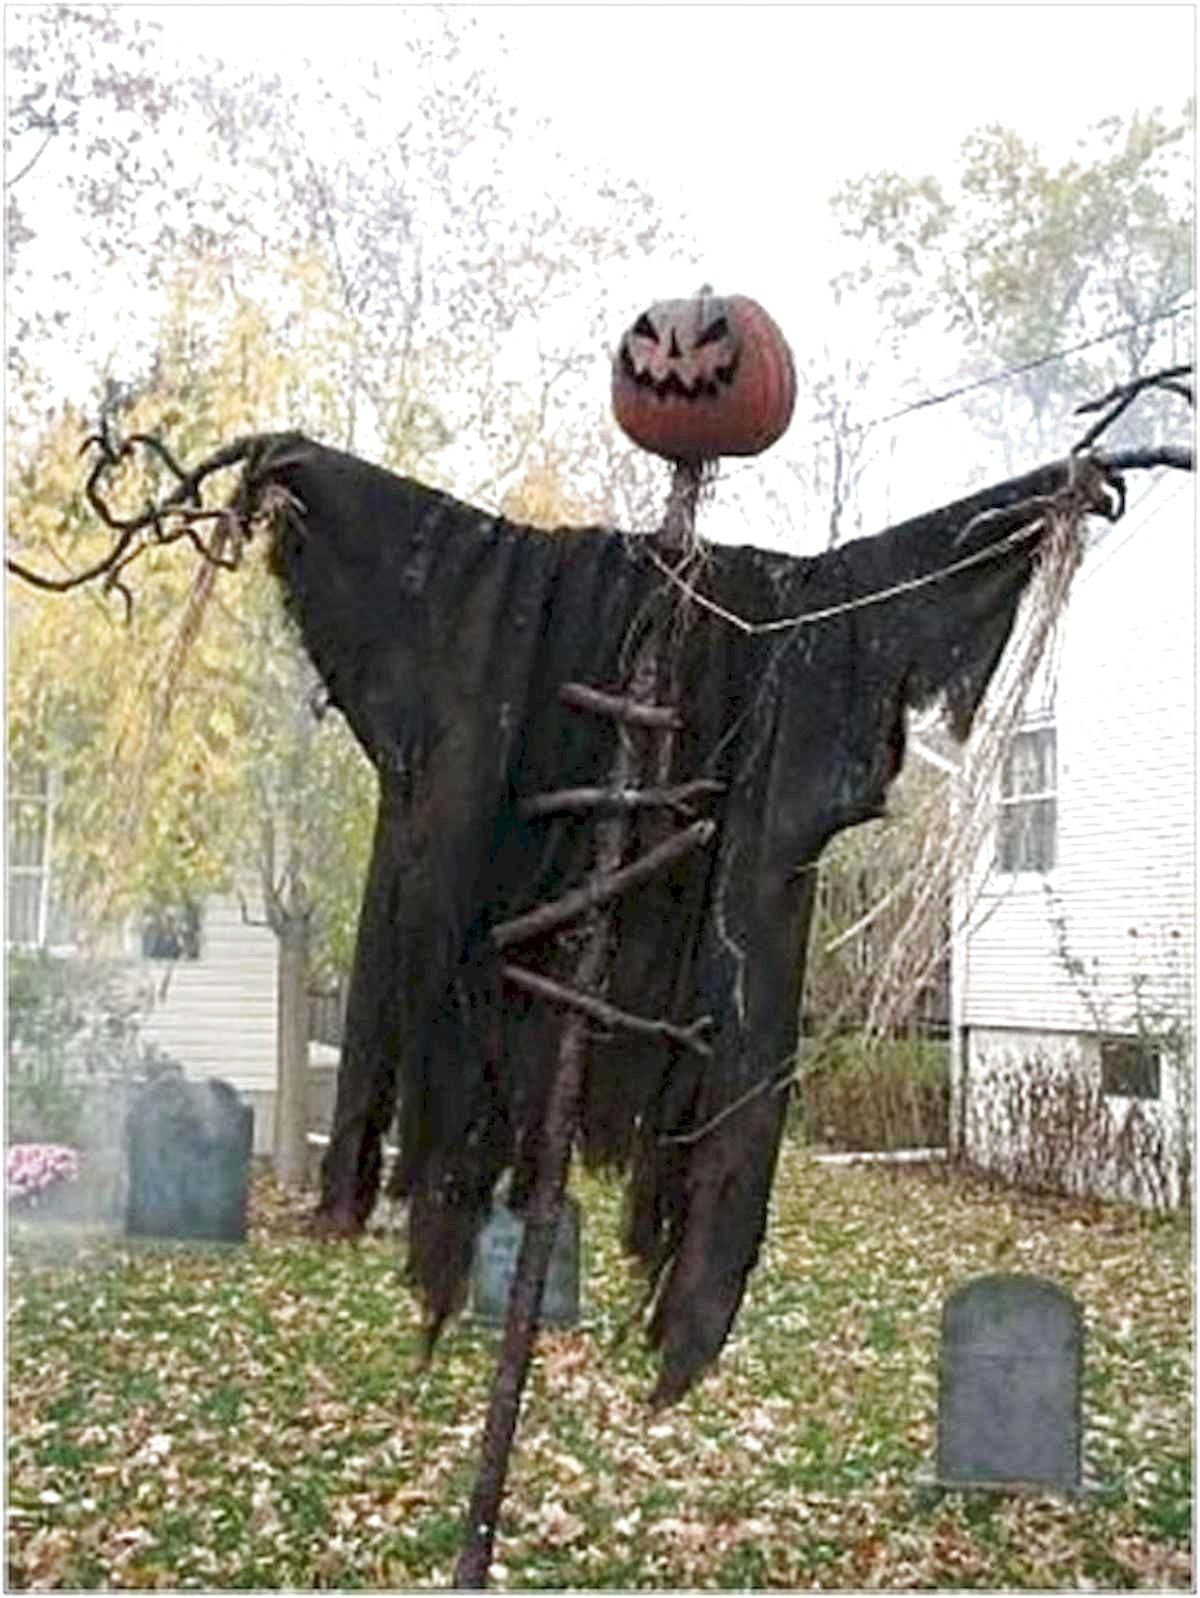 62 Favourite Diy Halloween Decorations Ideas The Expert Beautiful Ideas Fun Diy Halloween Decorations Outdoor Halloween Diy Halloween Decorations